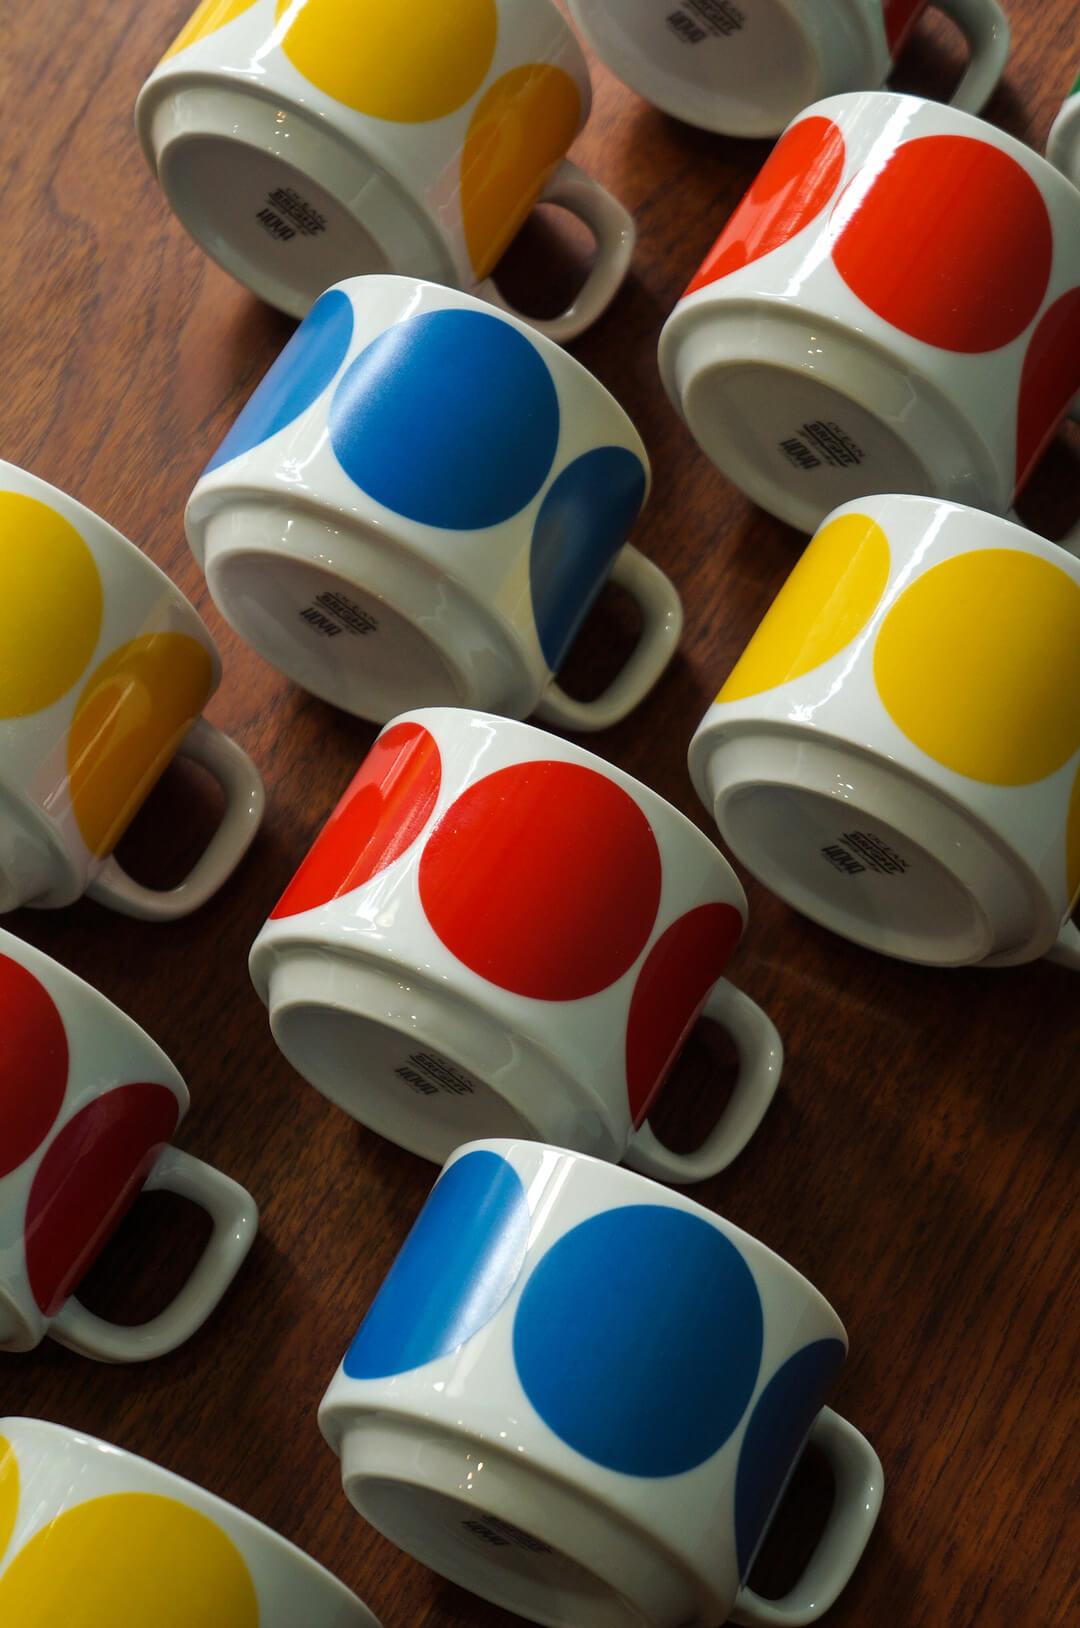 Japanese Vintage HOYA Stacking Mug Cup/ヴィンテージ ホーヤ スタッキングマグカップ 昭和レトロ 食器 1970年代